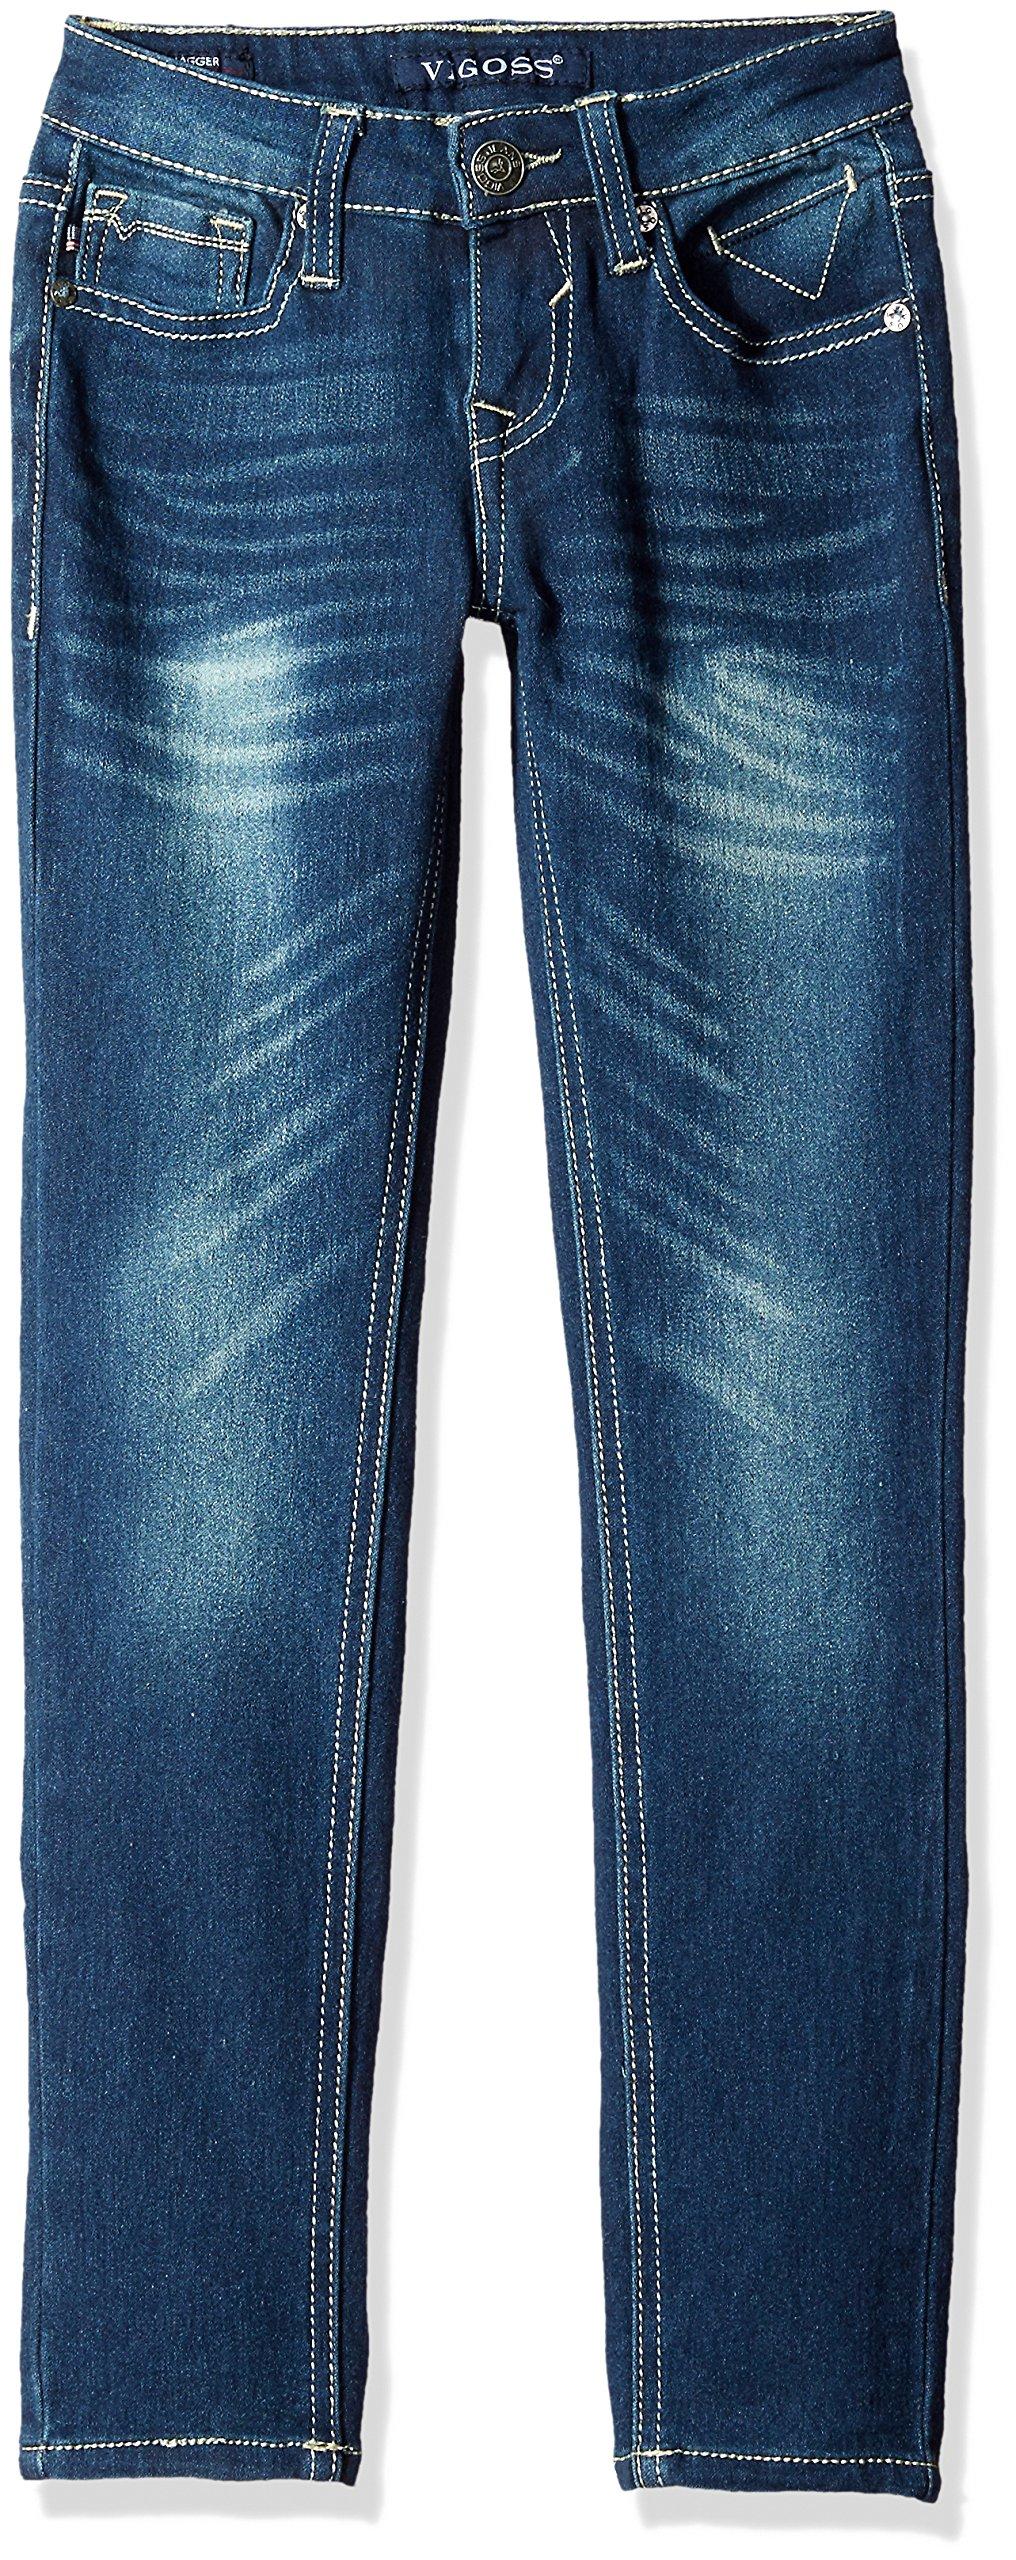 VIGOSS Girls' 5 Pocket Skinny Jean, Ink, 16